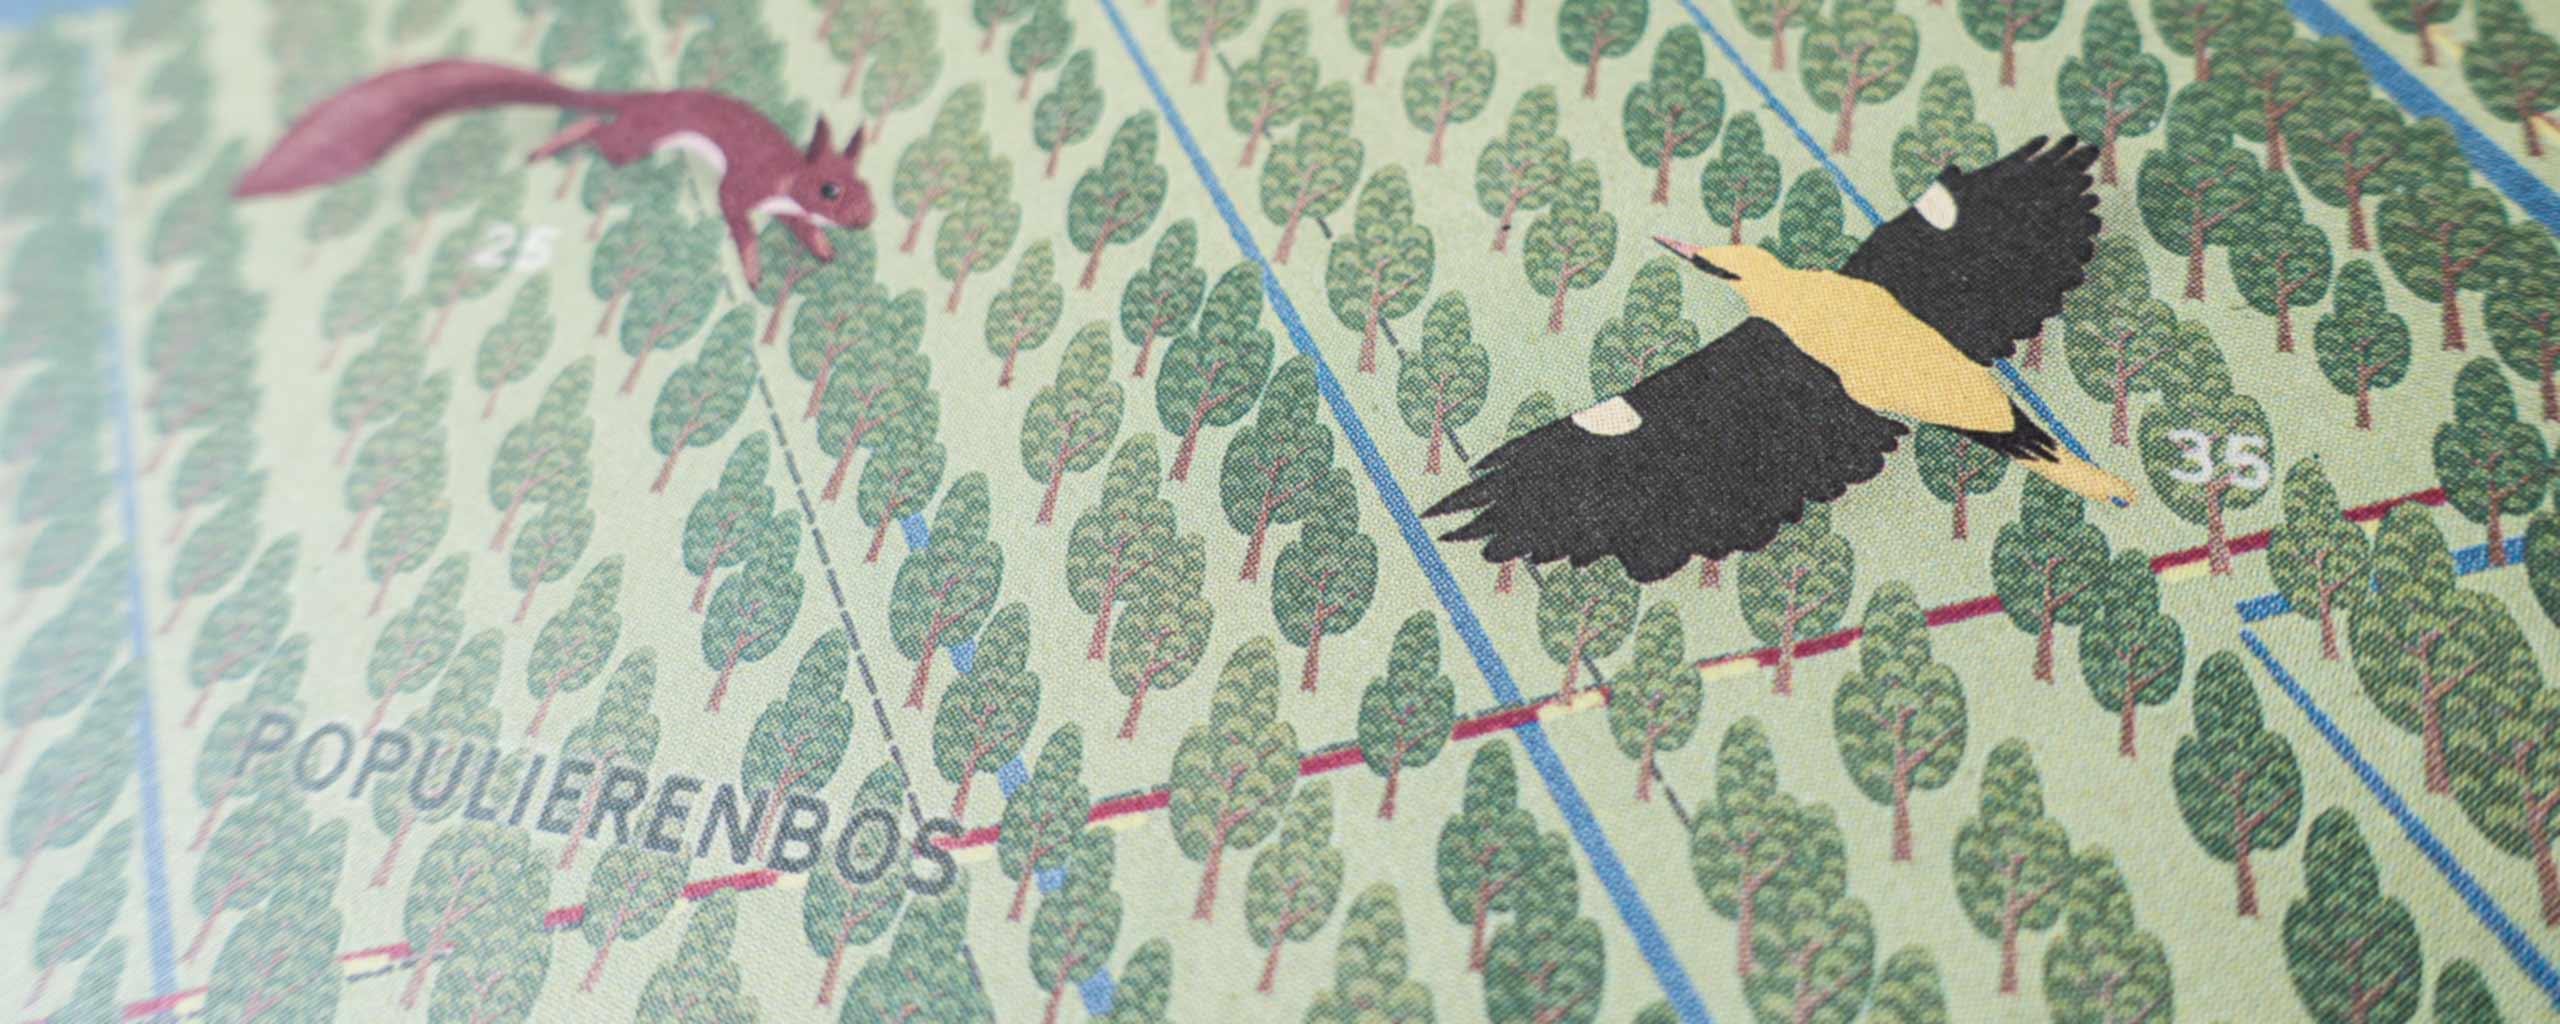 Illustrated Map Of De Hobokense Polder